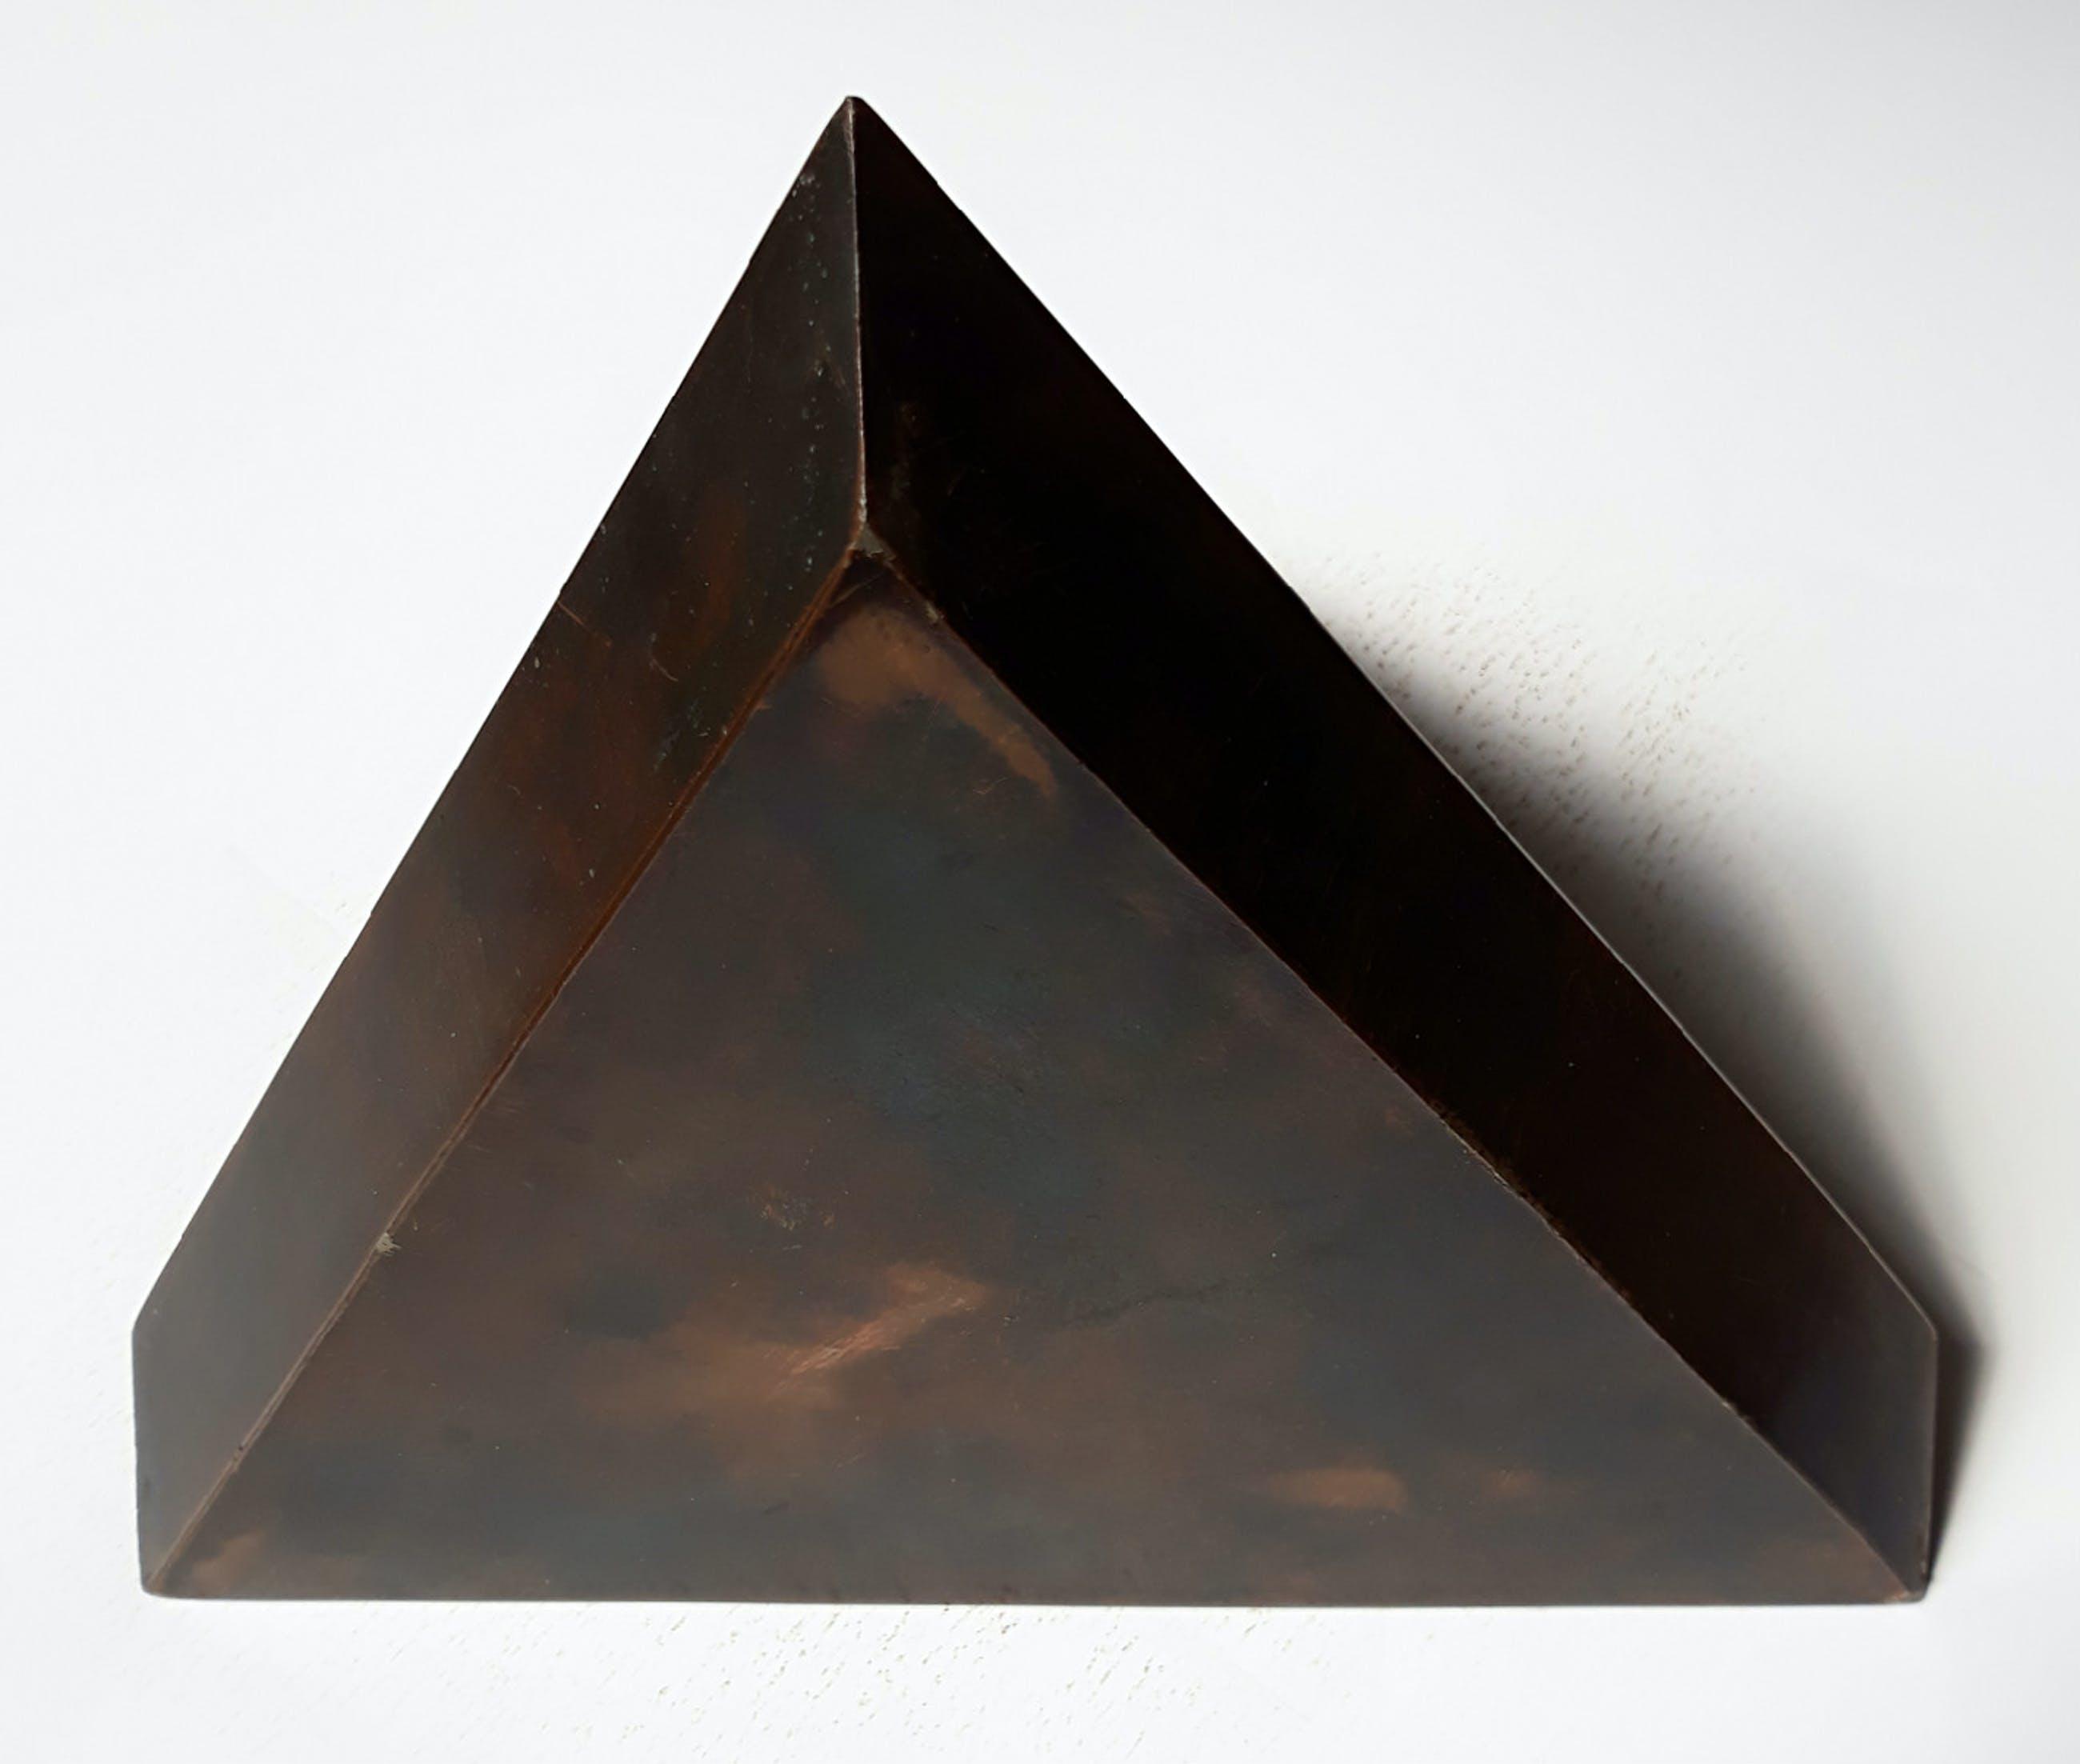 Nato Frascà - Pyramide-achtig object, brons kopen? Bied vanaf 300!